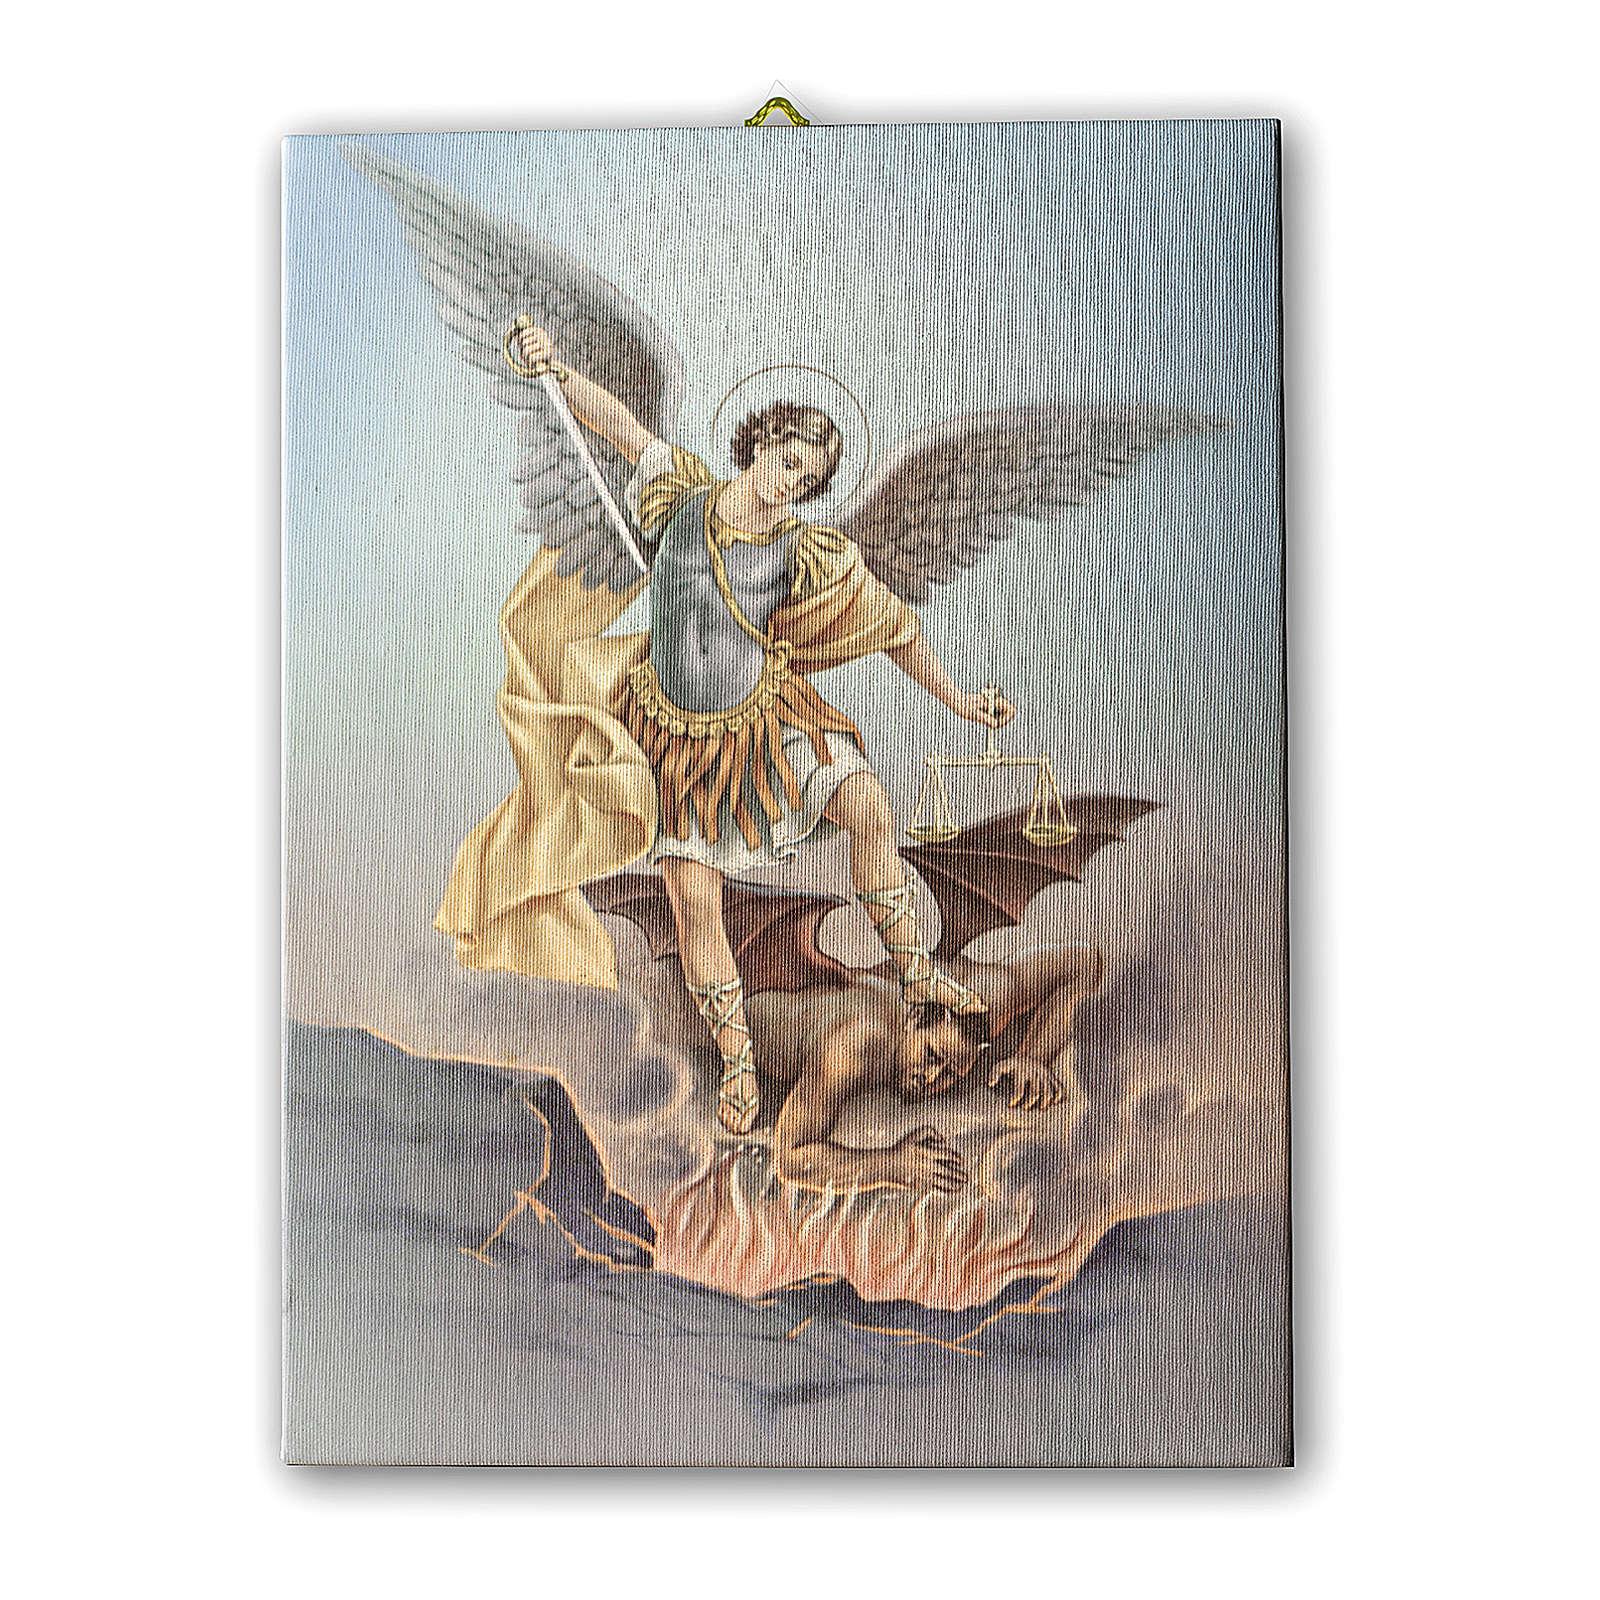 Quadro su tela pittorica San Michele Arcangelo 40x30 cm 3